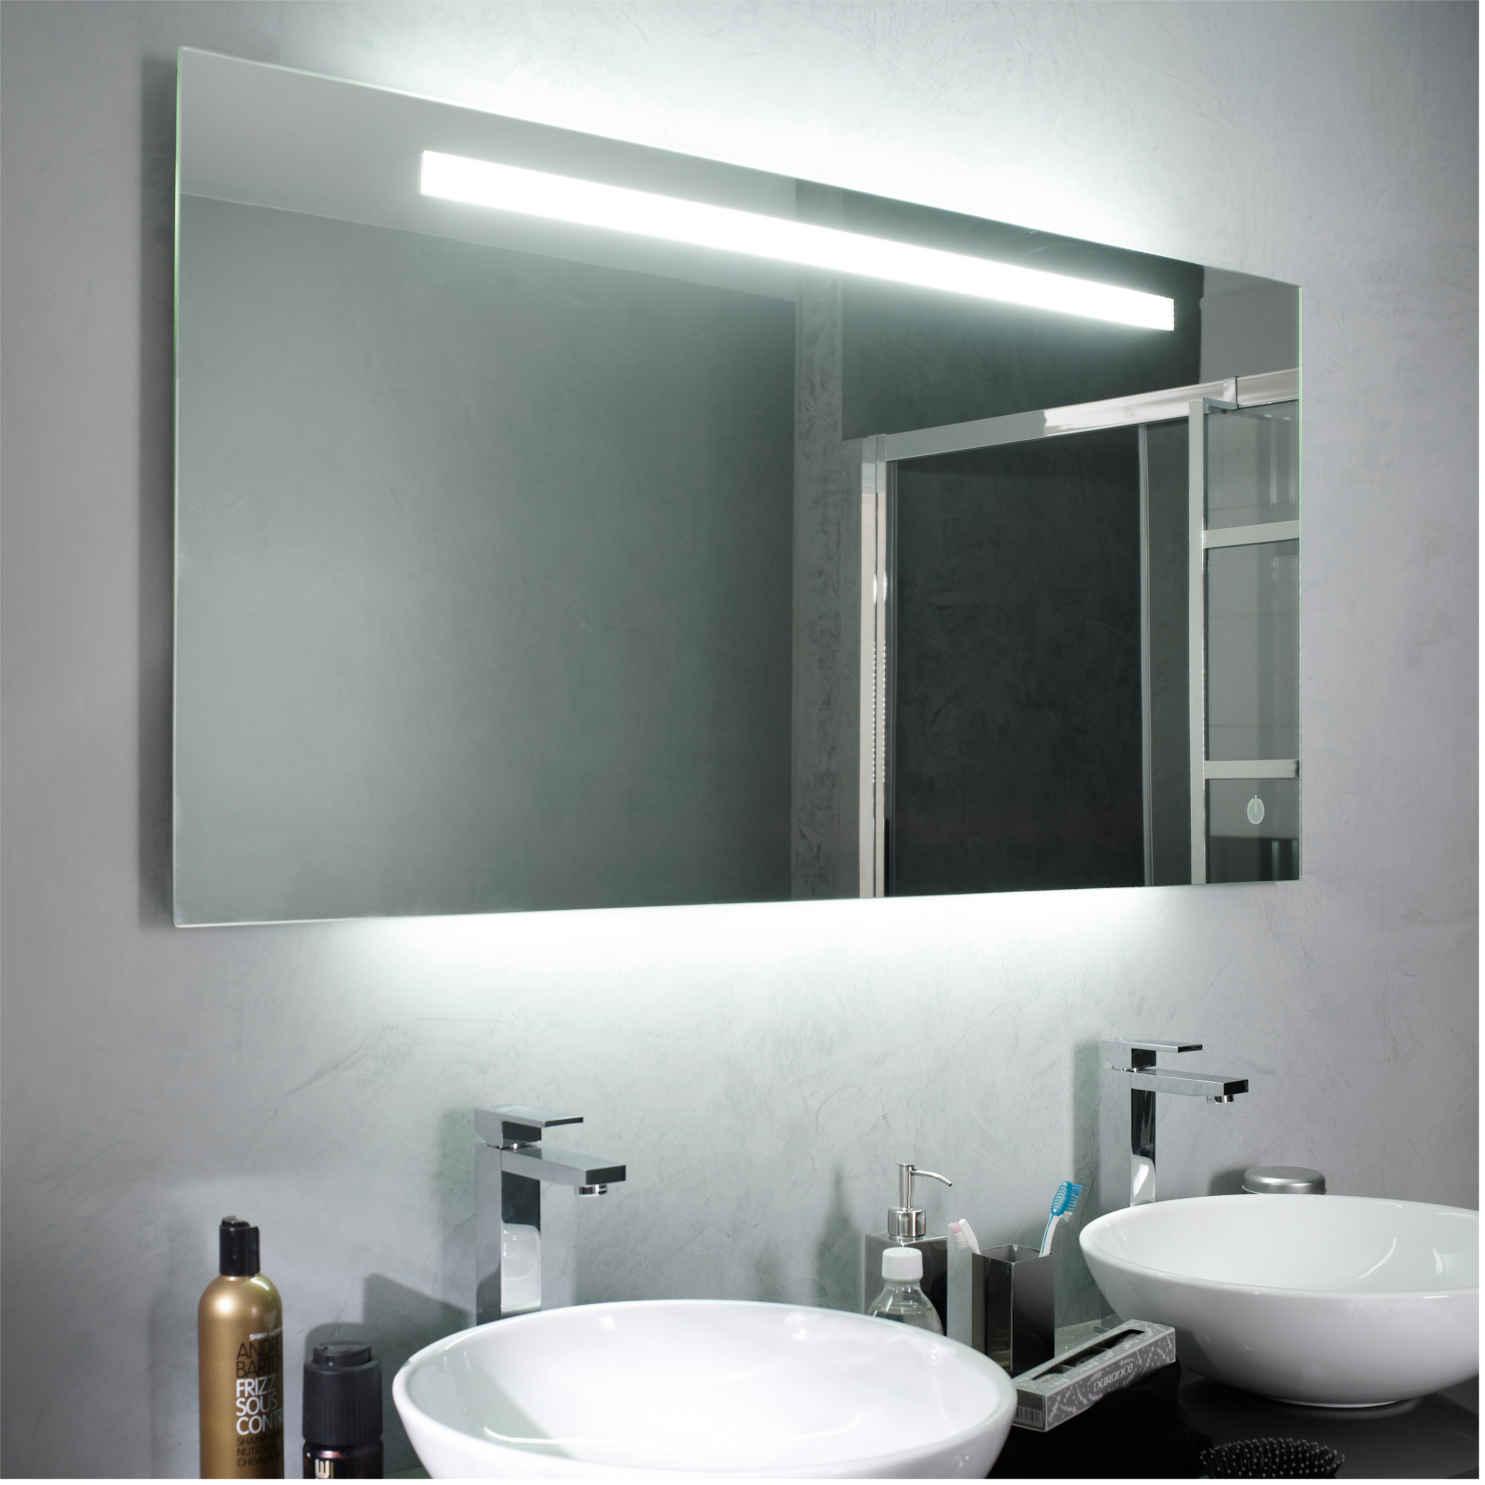 eclairage indirect salle de bain Miroir lumineux